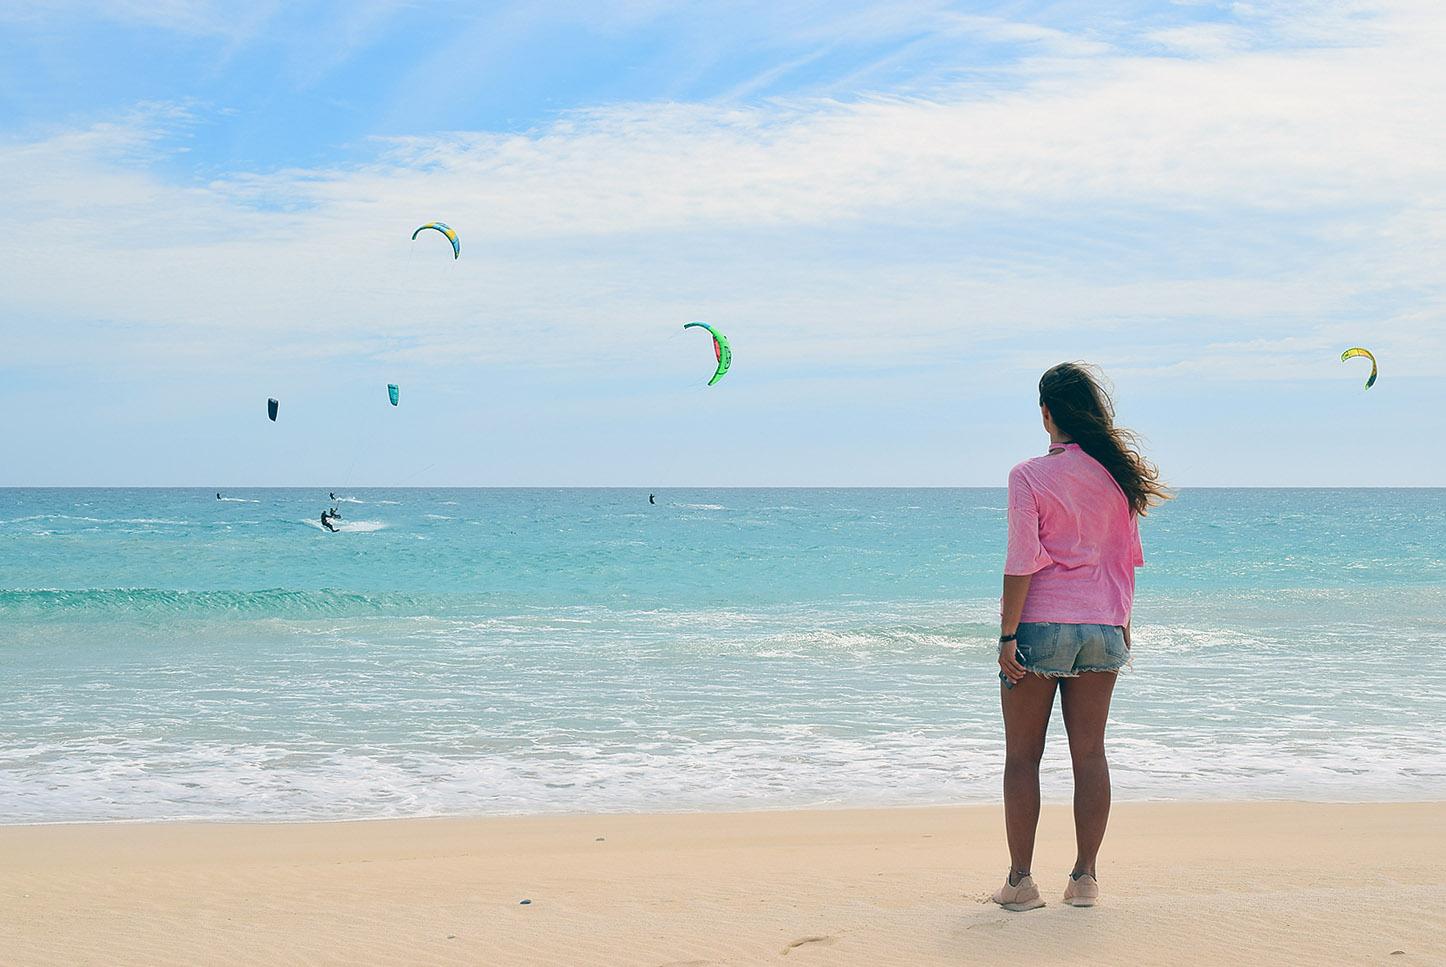 Kitesurfing Trips and excursions -  Morabeza Kitesurfing in Boa Vista Cape Verde (19).jpg